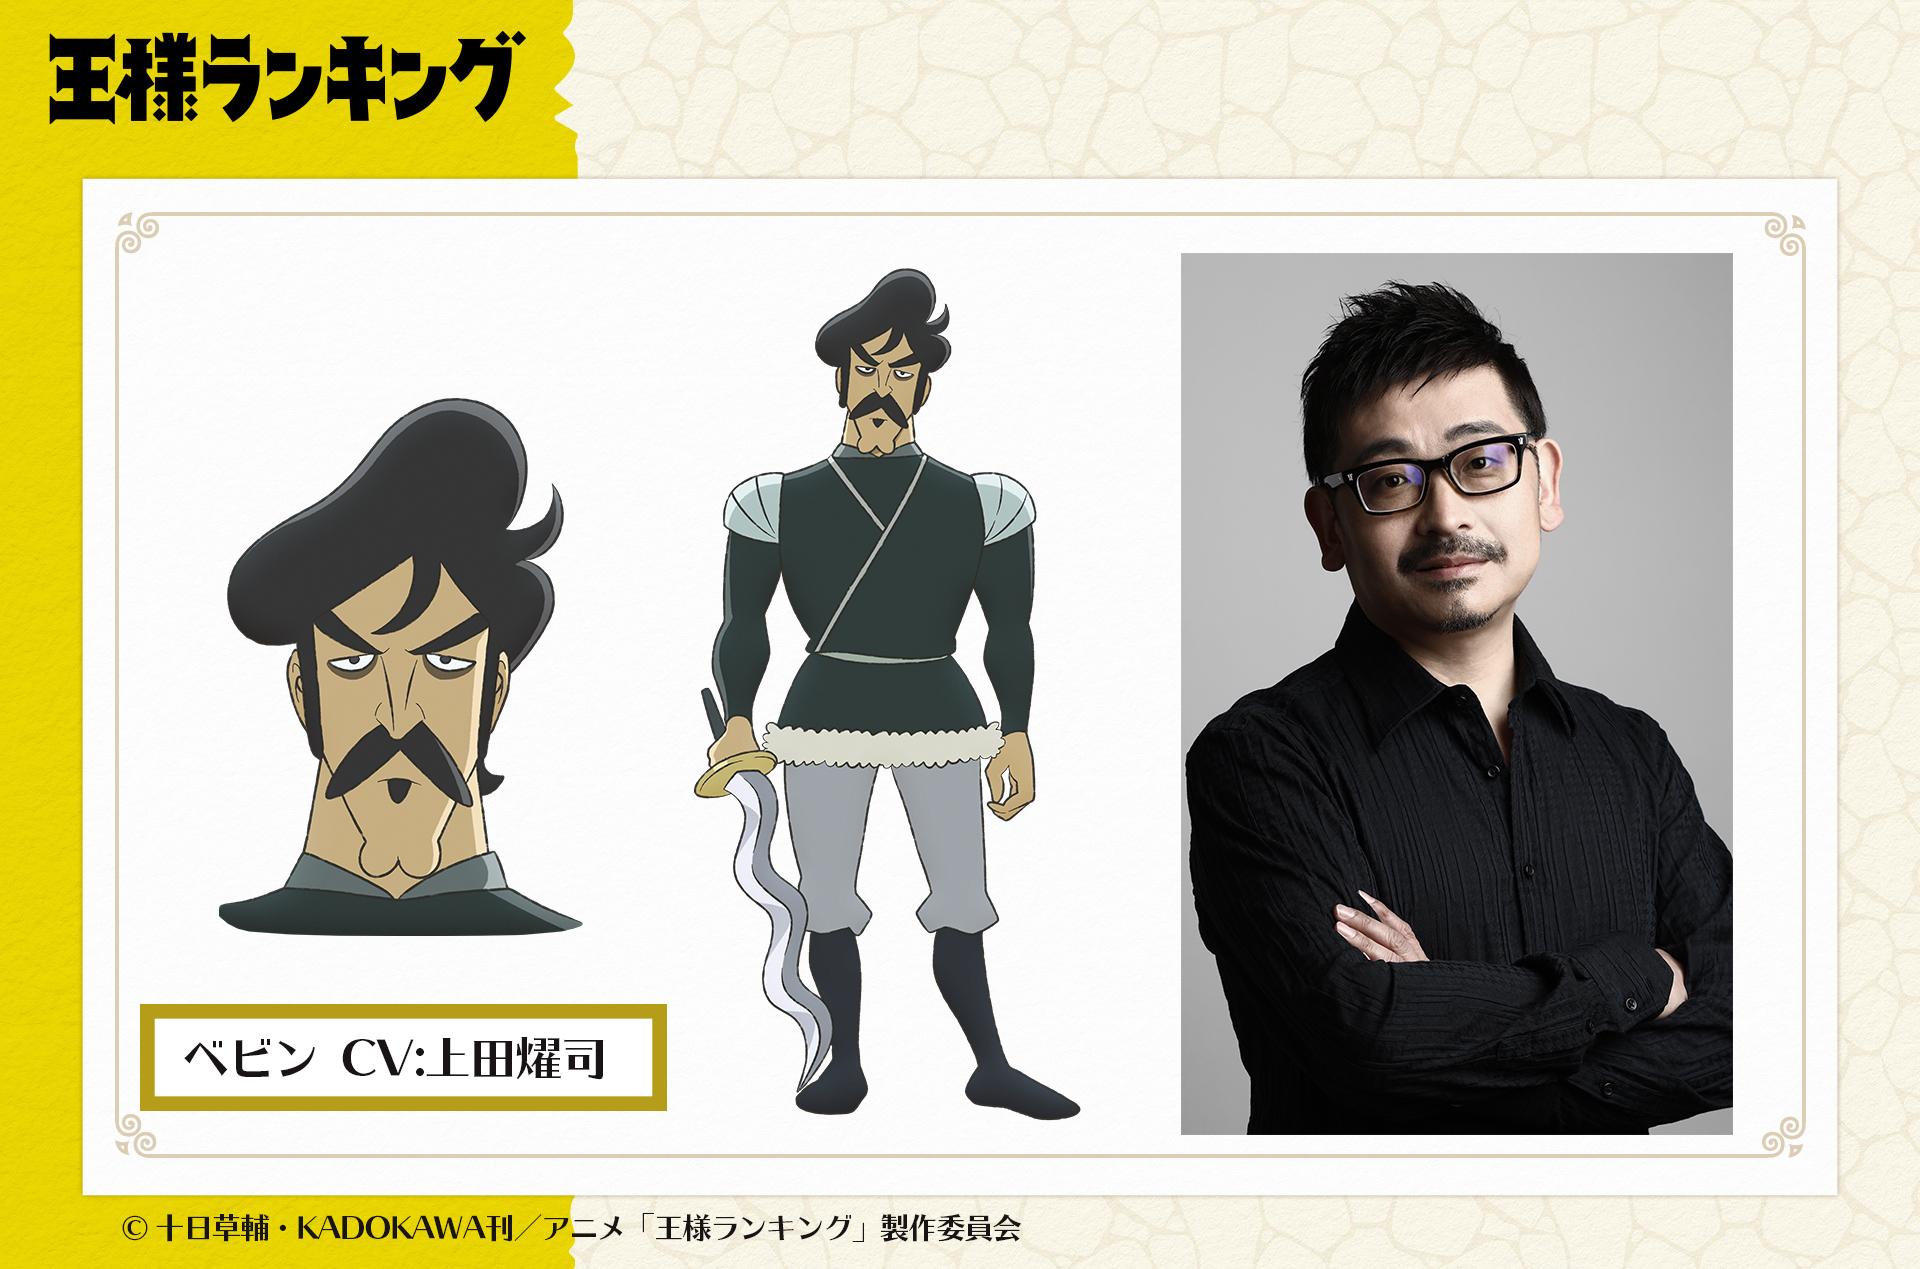 TVアニメ「王様ランキング」ベビン CV:上田燿司さん